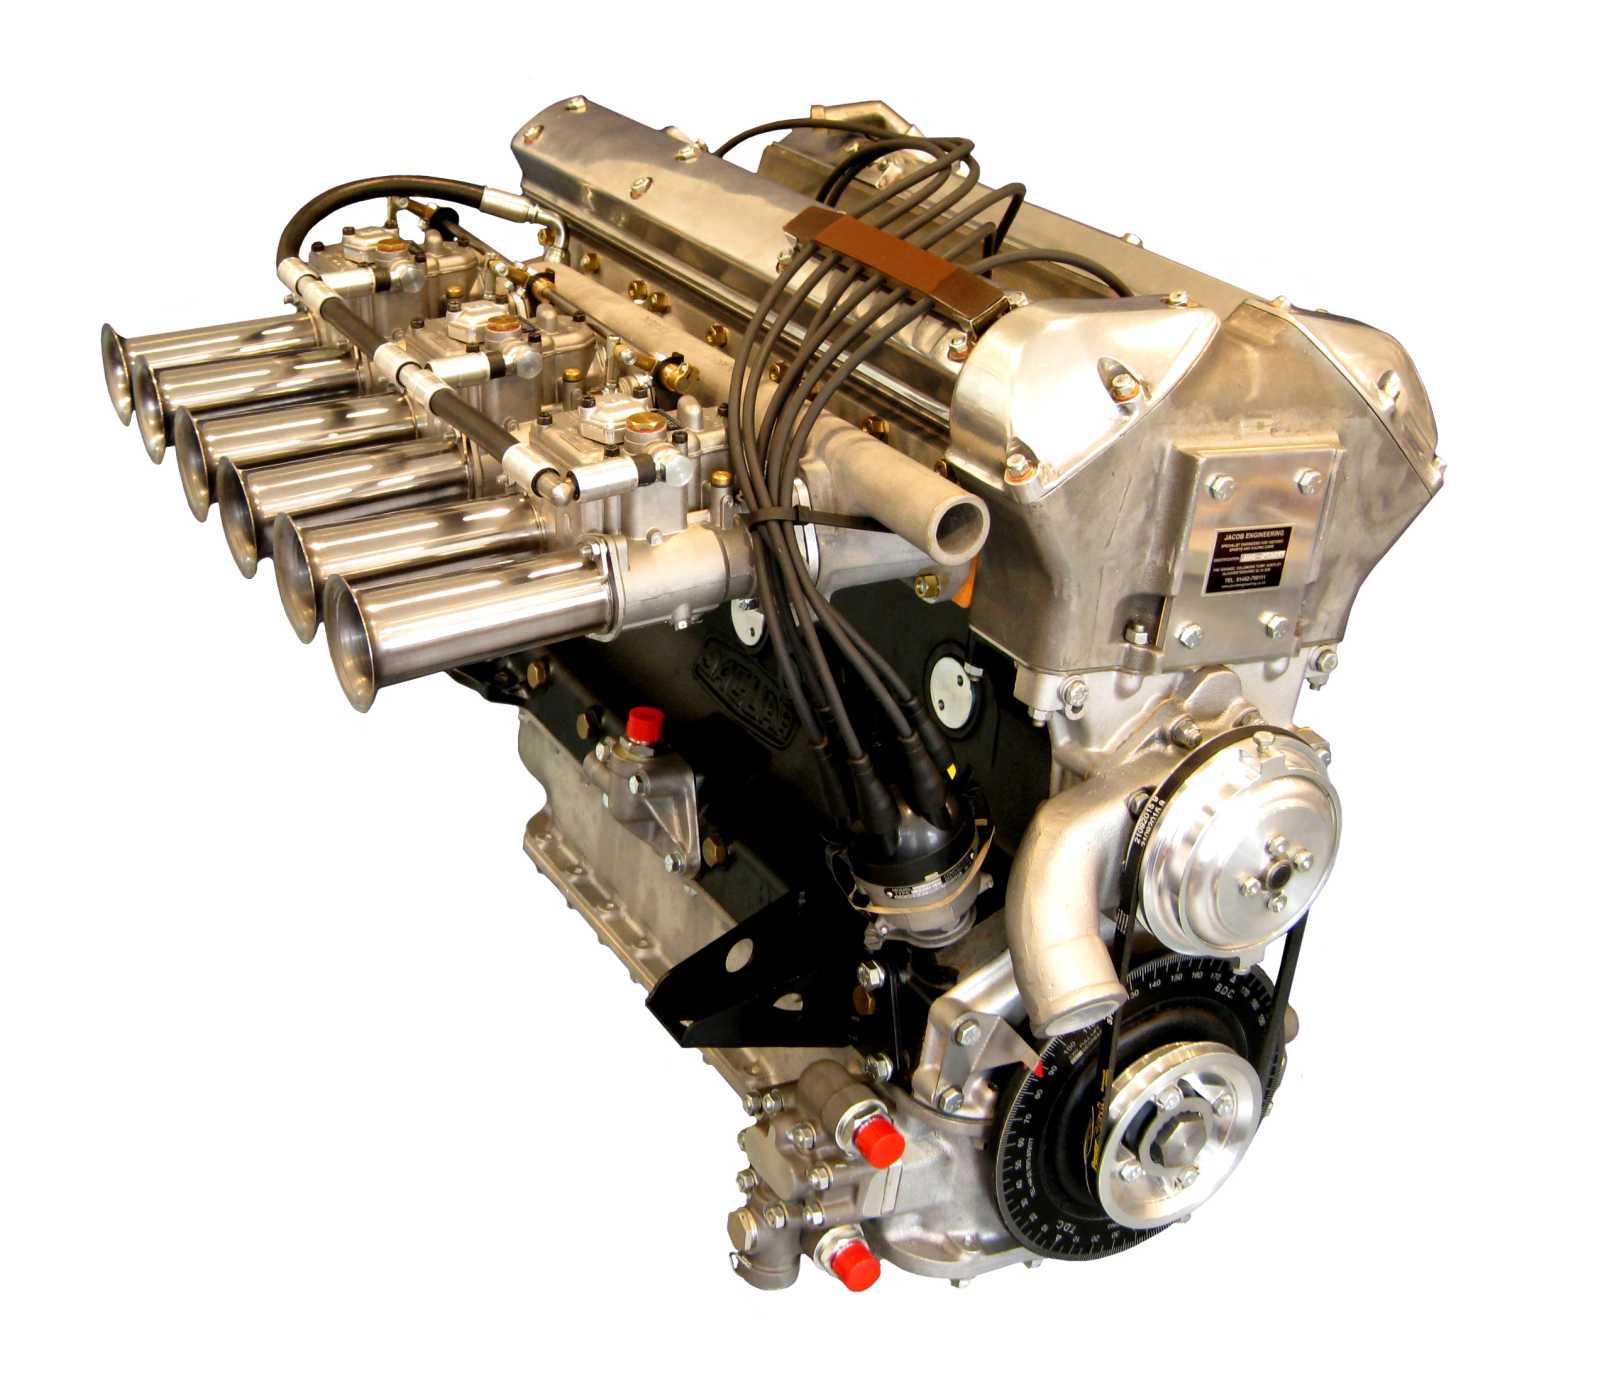 forums plastic jaguar forum parts xkr engines function xk hydrographic cover engine printing